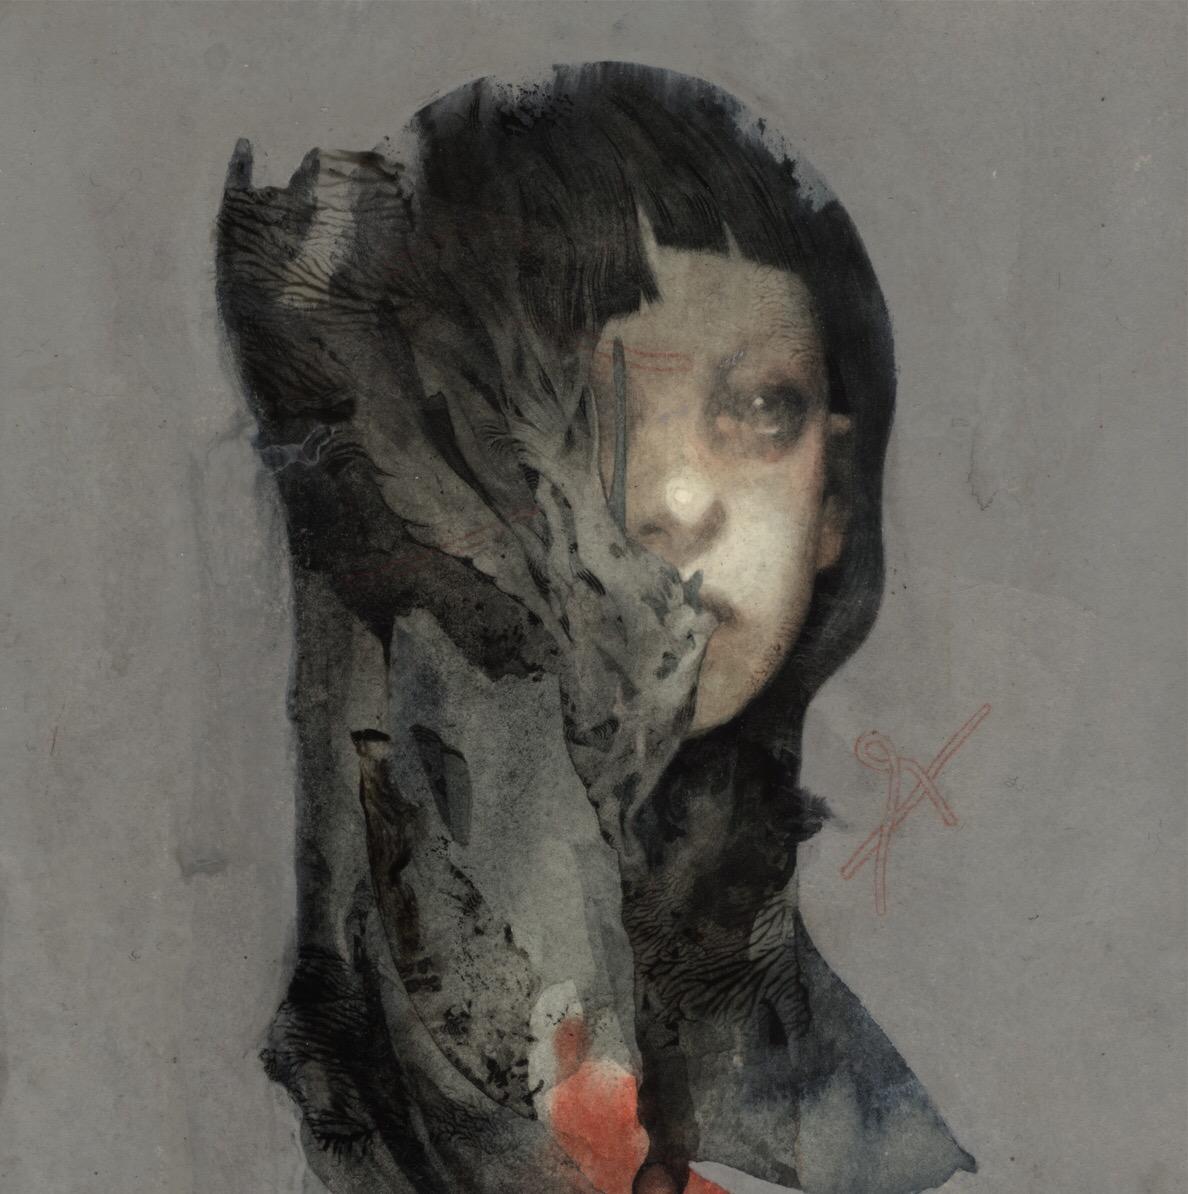 Joao Ruas , Feral Kid, painting, illustration, dark, obscure